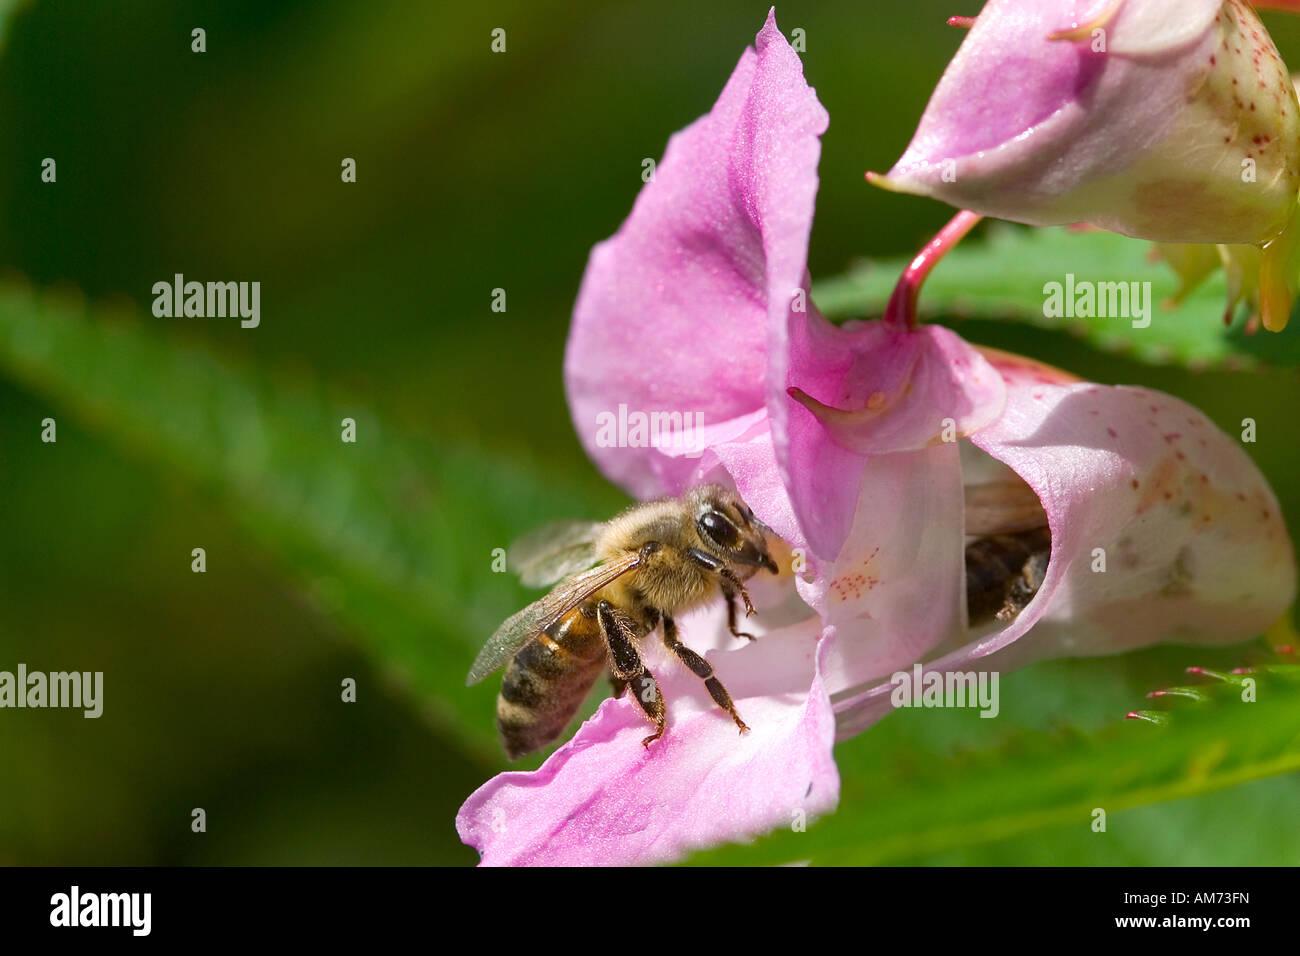 Bee at a blossom, Himalayan Balsam Stock Photo